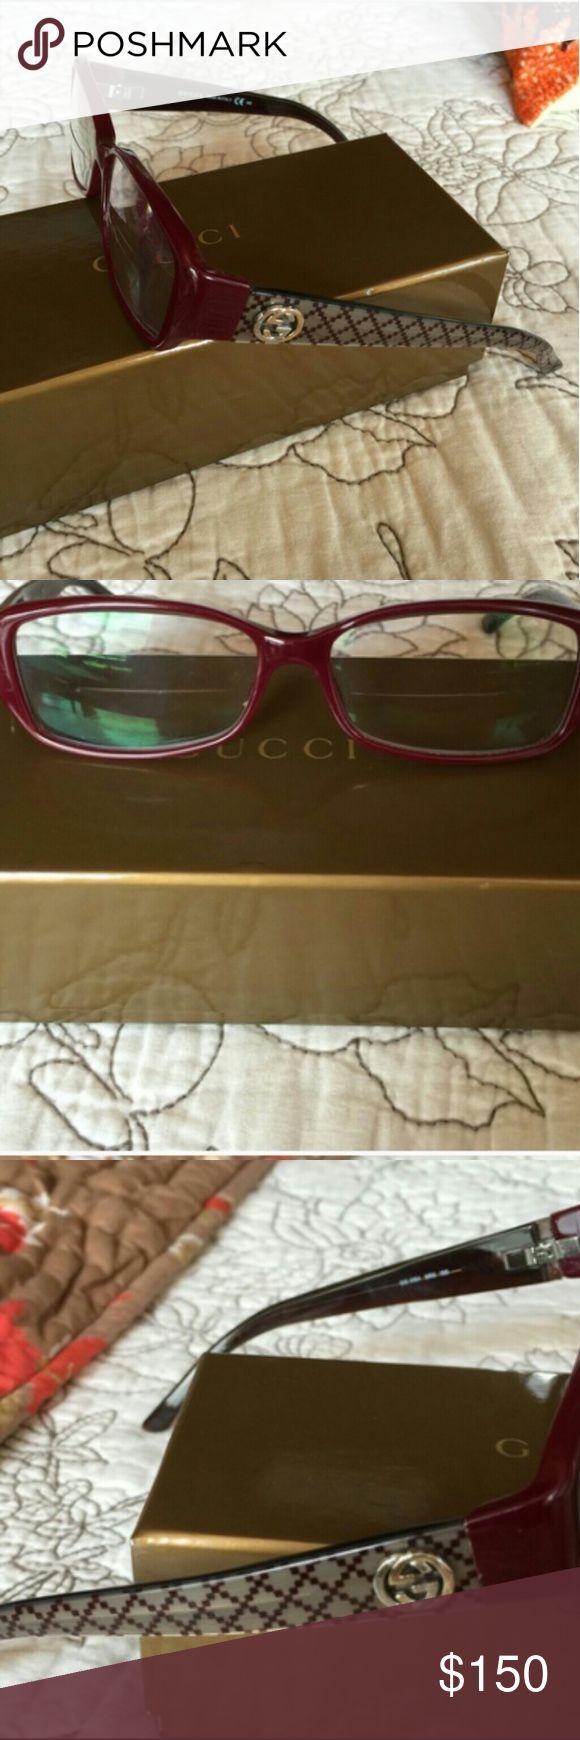 25 Best Ideas About Gucci Eyeglasses On Pinterest Www